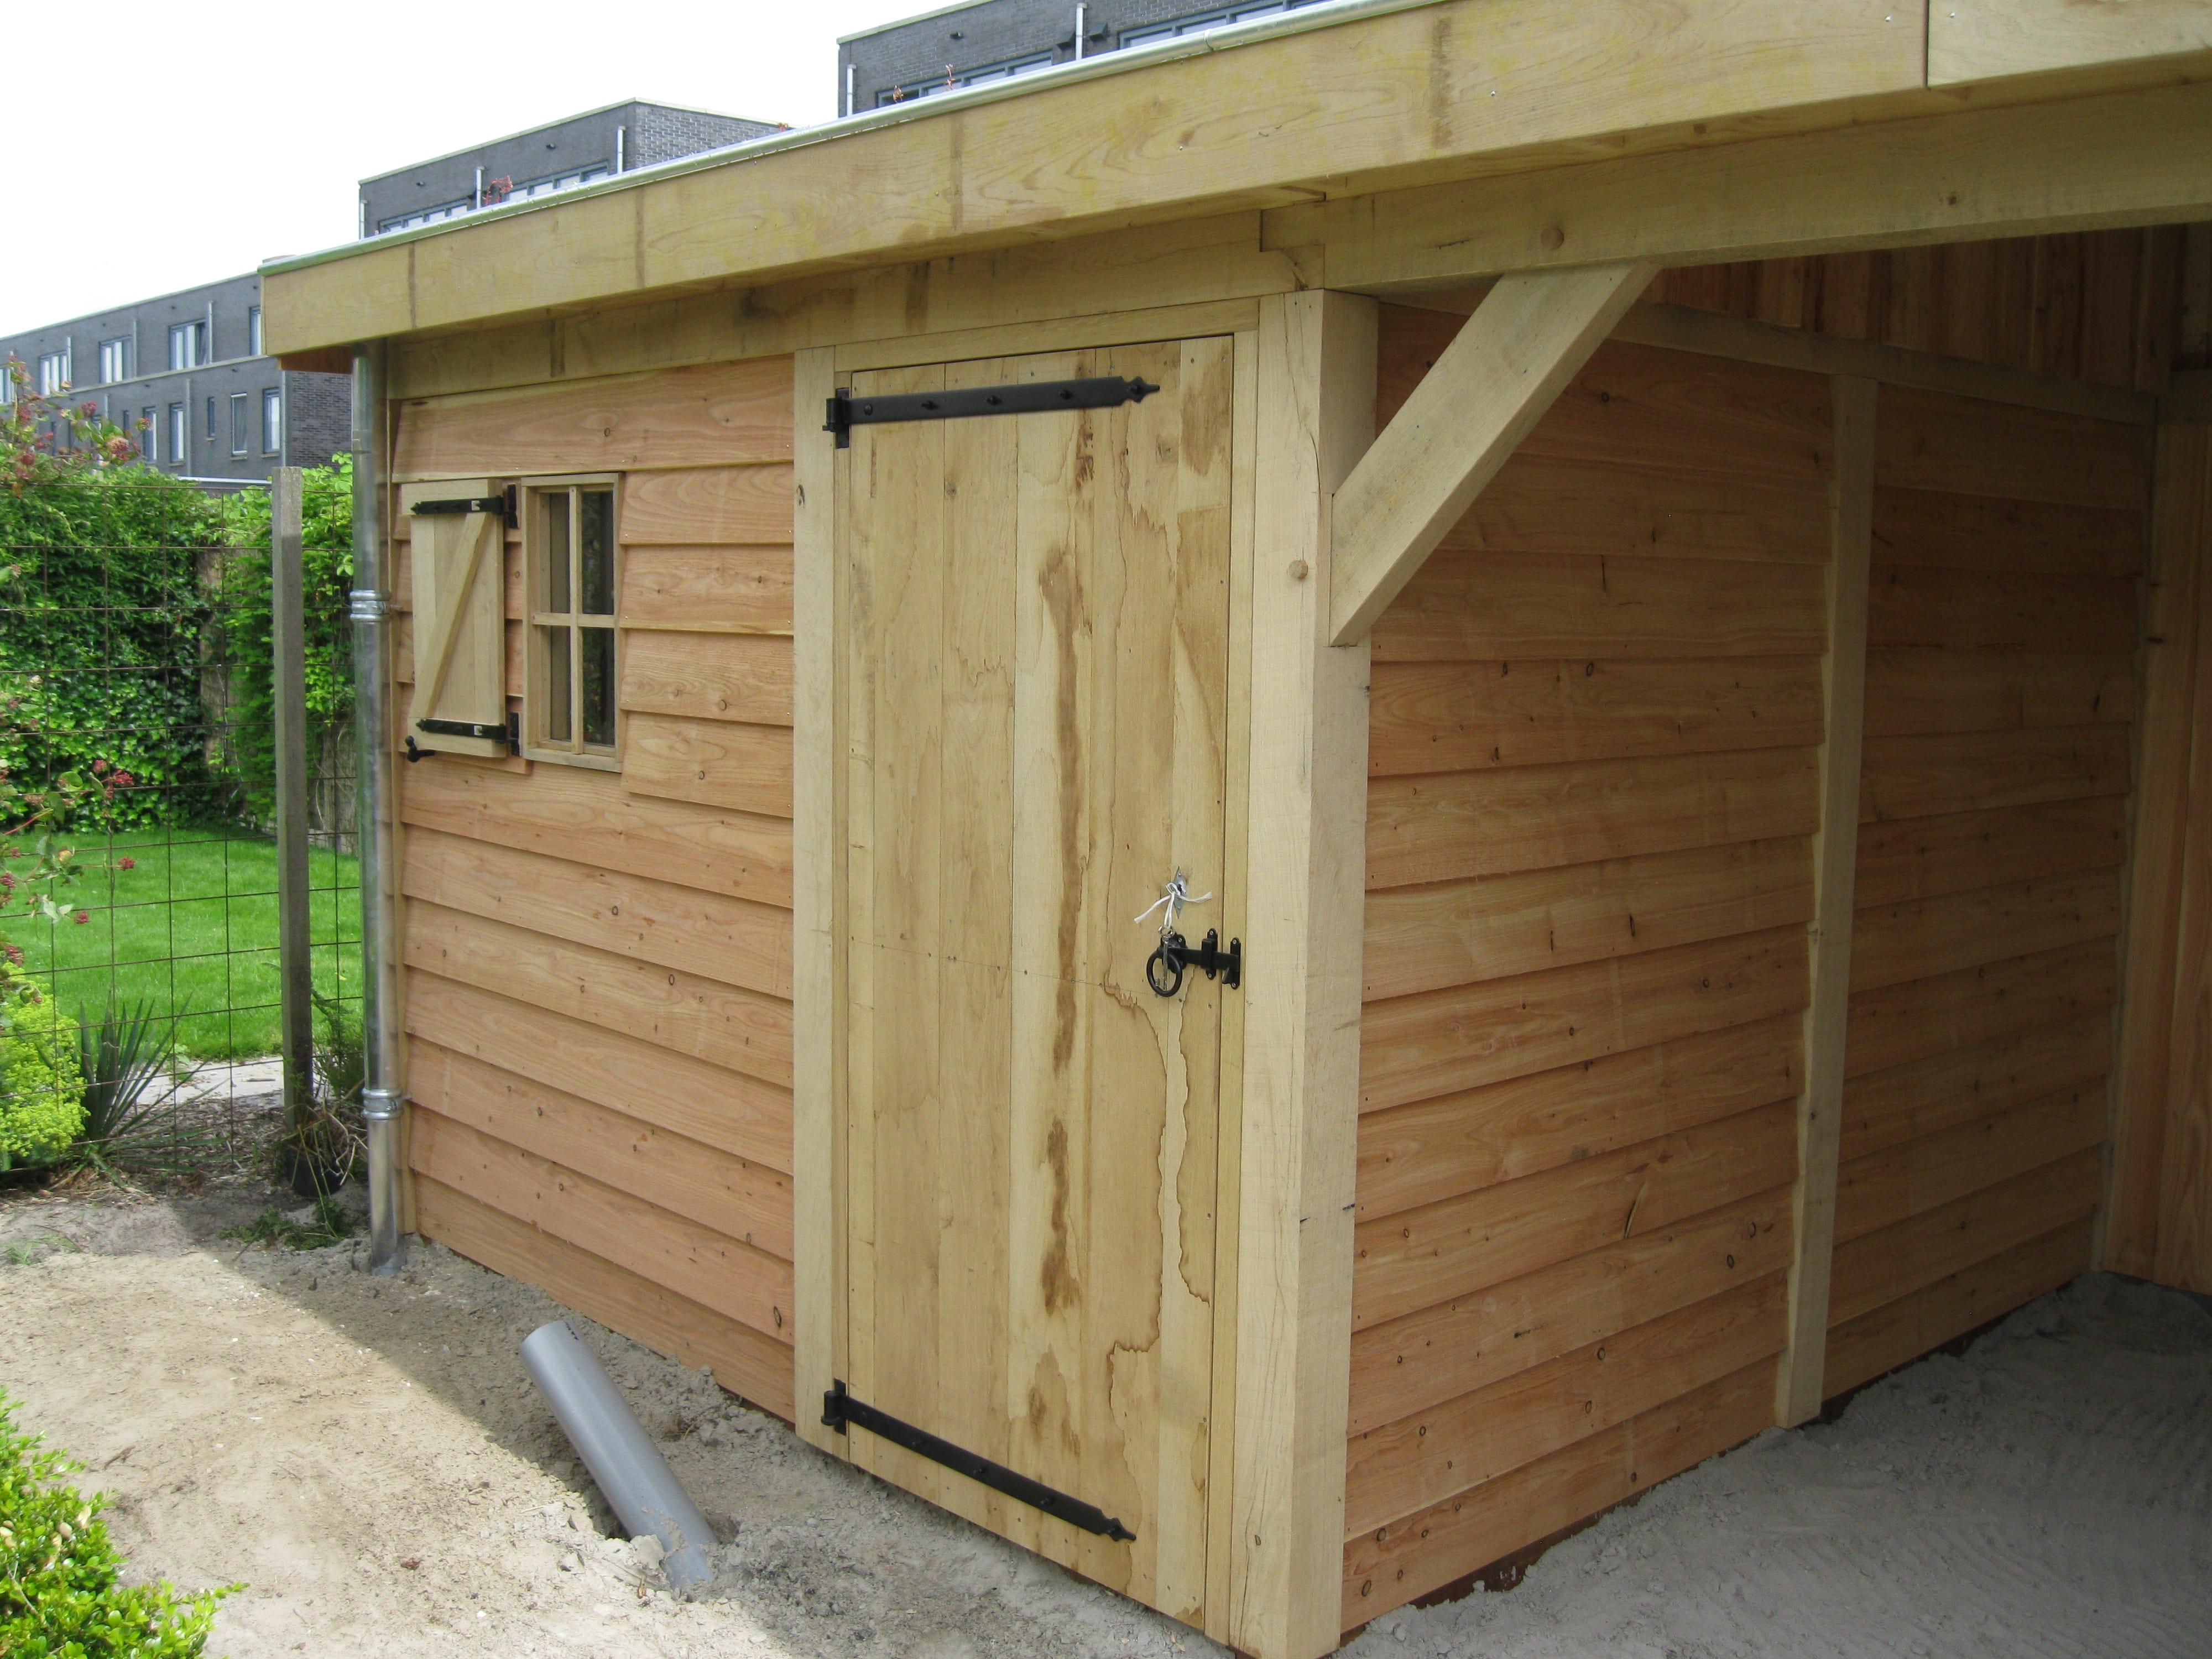 Houten-tuinhuis-met-tuinkamer-groendak-3-min - tuinhuis met veranda 'groendak'